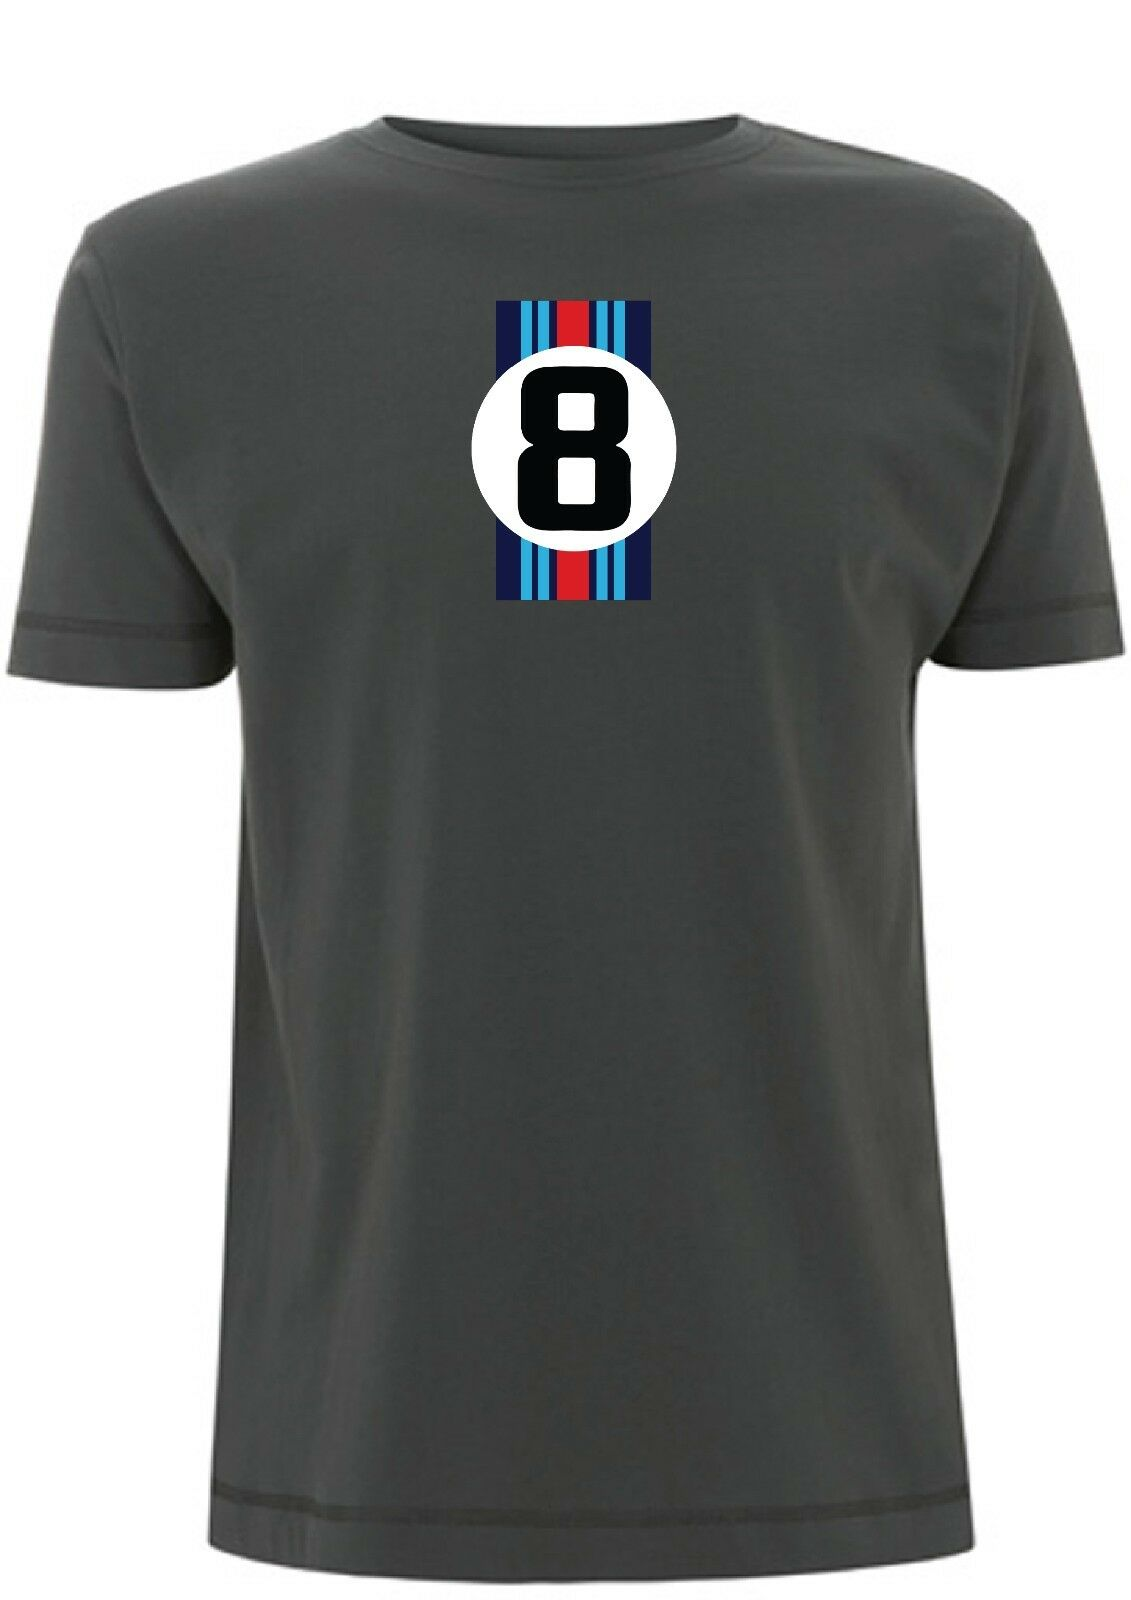 Targa Florio T Shirt Martini Racing inspired Motorsport 911 RSR 1973 winner no 8